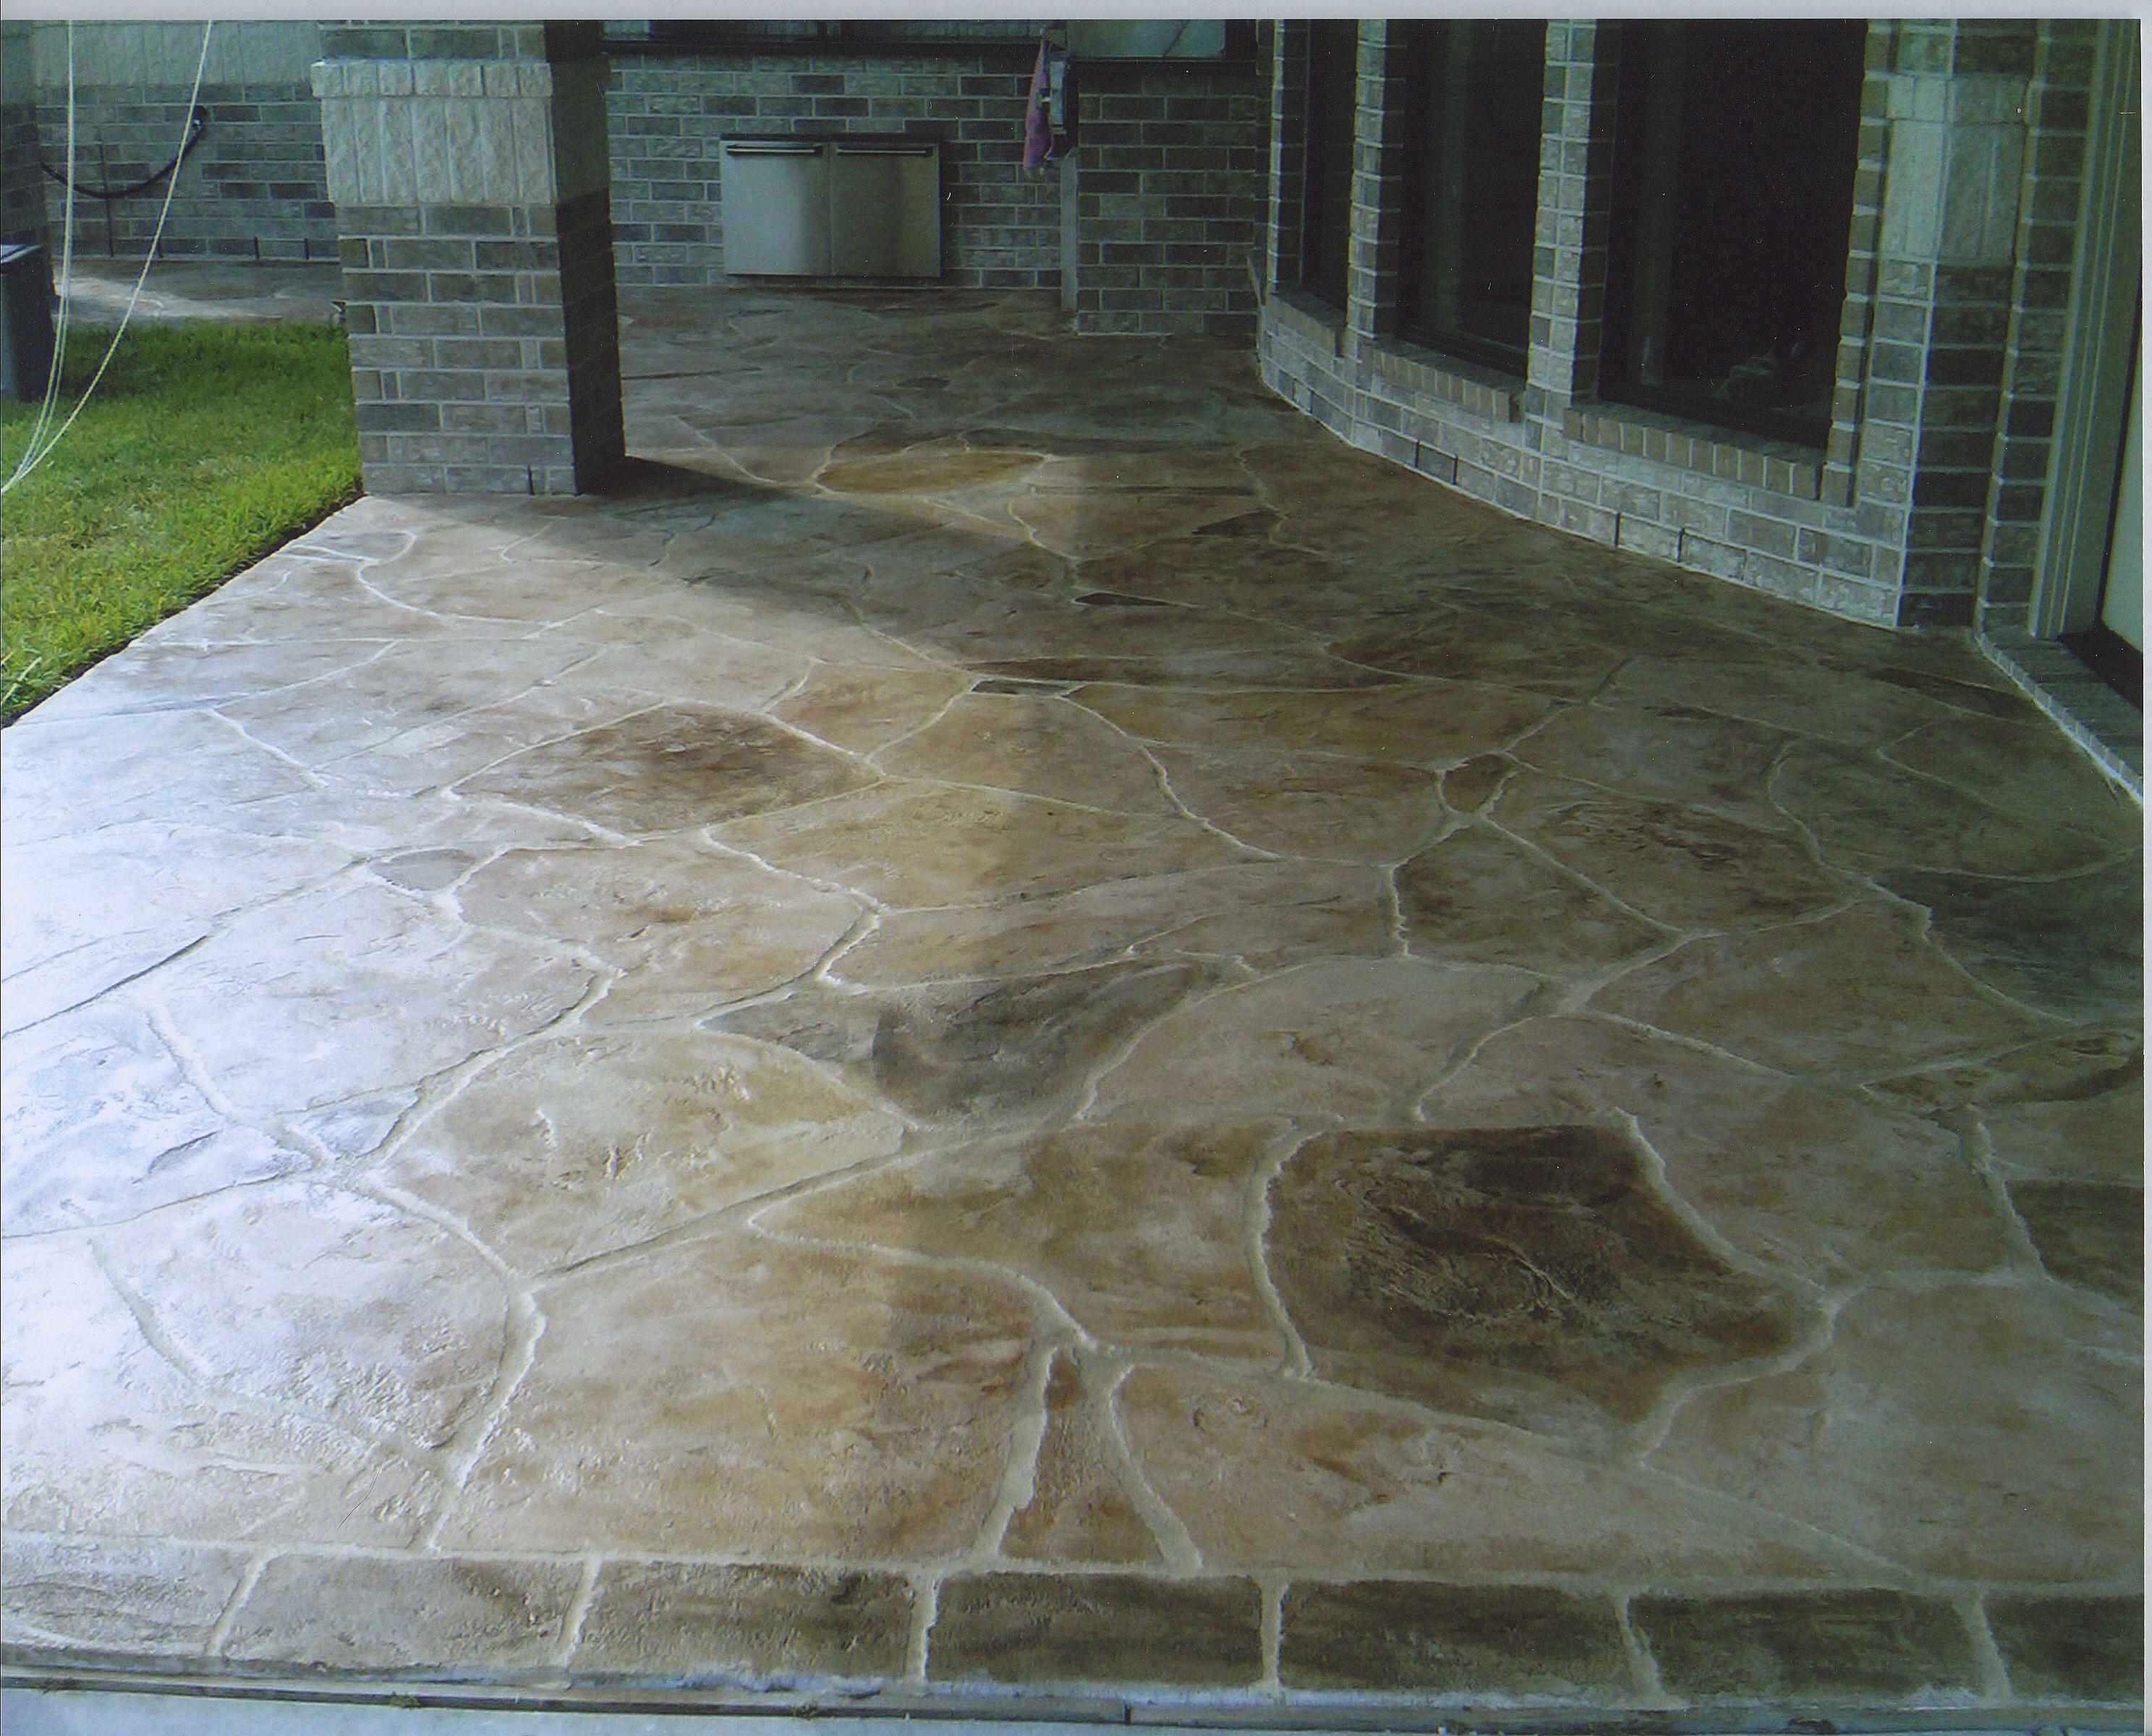 Huntsville Alabama Epoxy Garage Flooring Choices And Options: Garage Floor  Patio Concrete